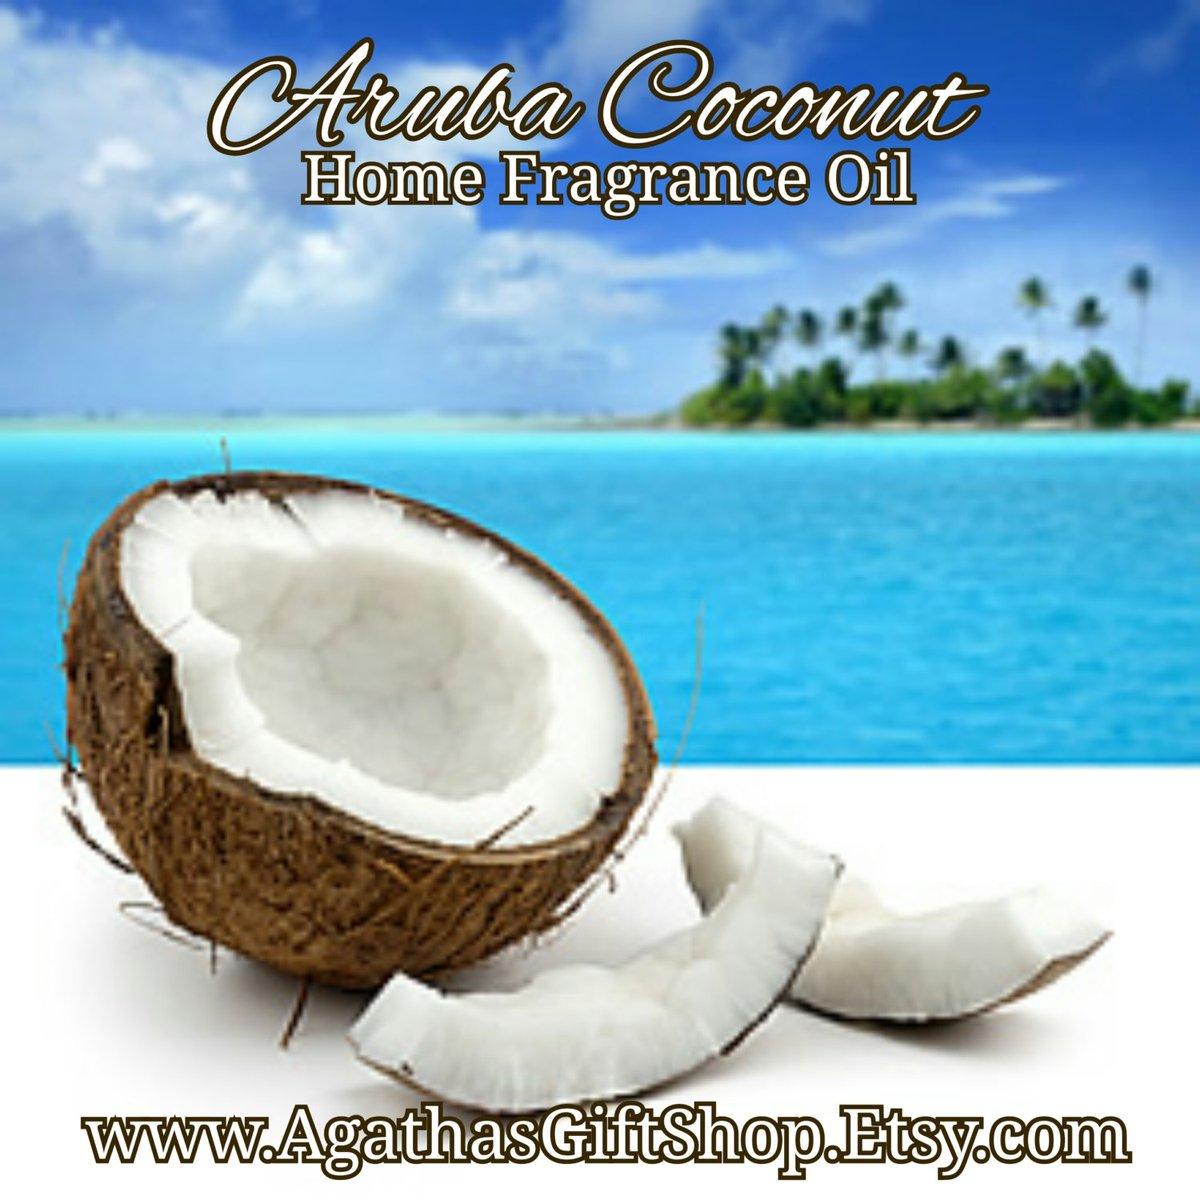 Aruba Coconut (Type) Home Fragrance Diffuser Warmer Aromatherapy Burning Oil  #Incense #HomeFragranceOil #Etsy #CyberMonday #HerbalRemedies #GiftShopSale #BlackFriday #PerfumeBodyOils #AromatherapyOil #Wedding #Etsygifts